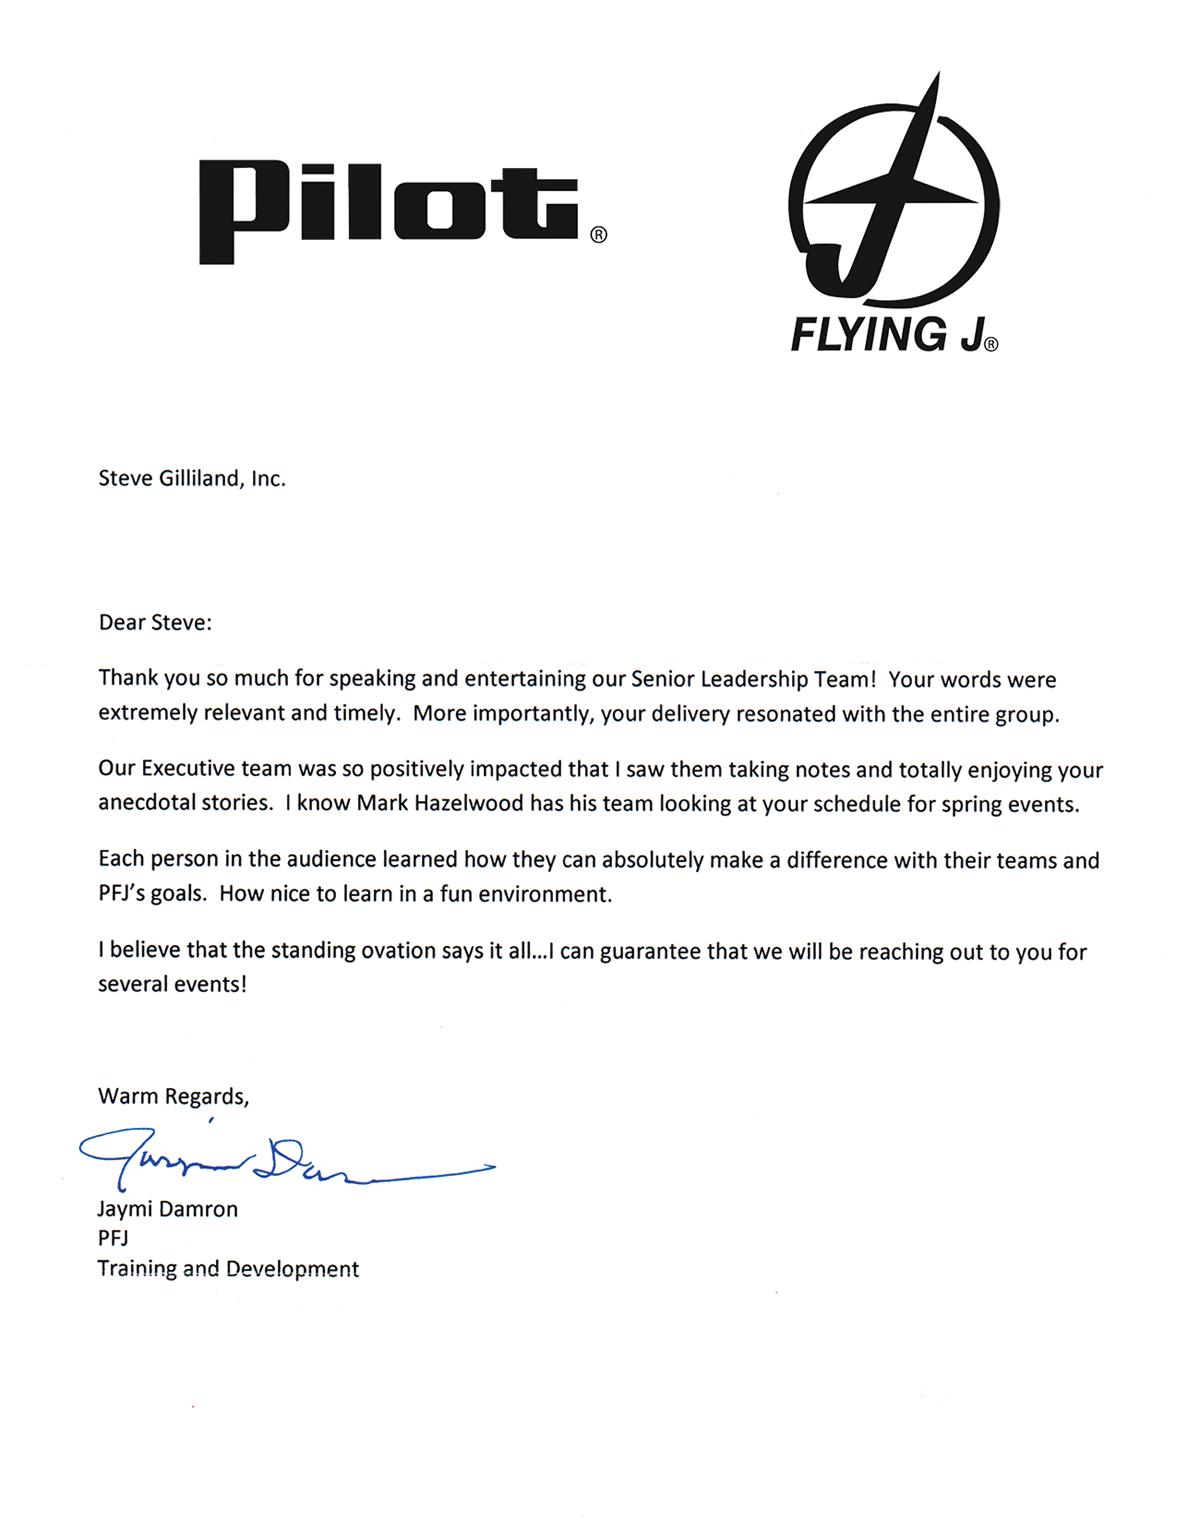 PilotFlying-J